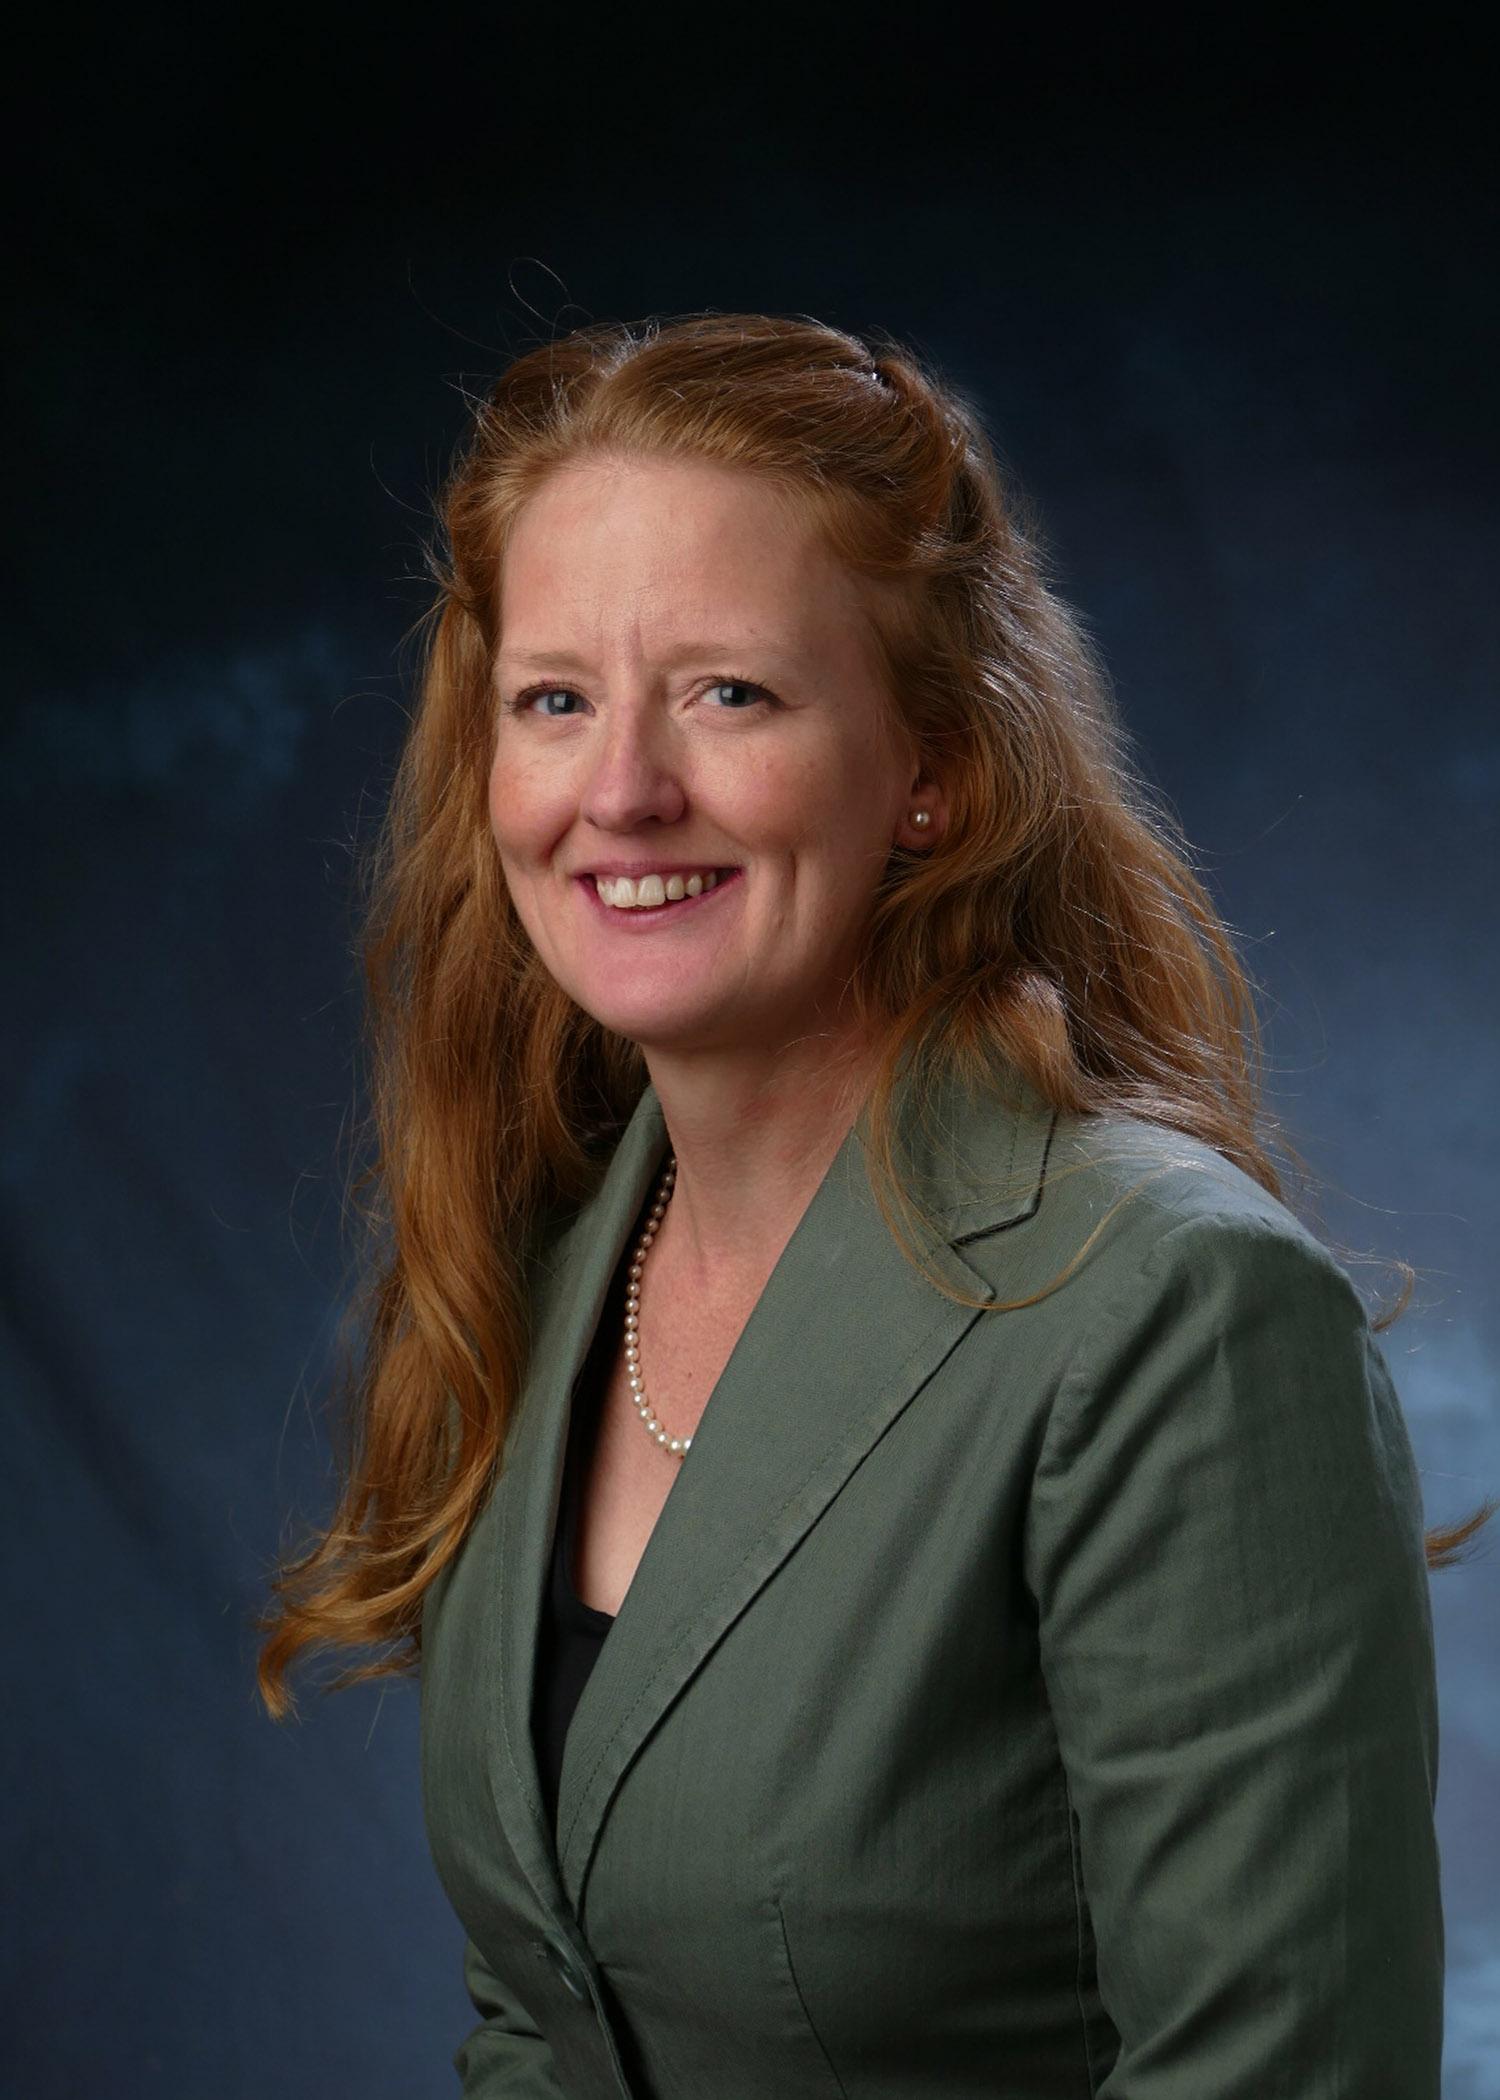 Monica_Hall1.JPG (Photo by Glenn Asakawa/University of Colorado)